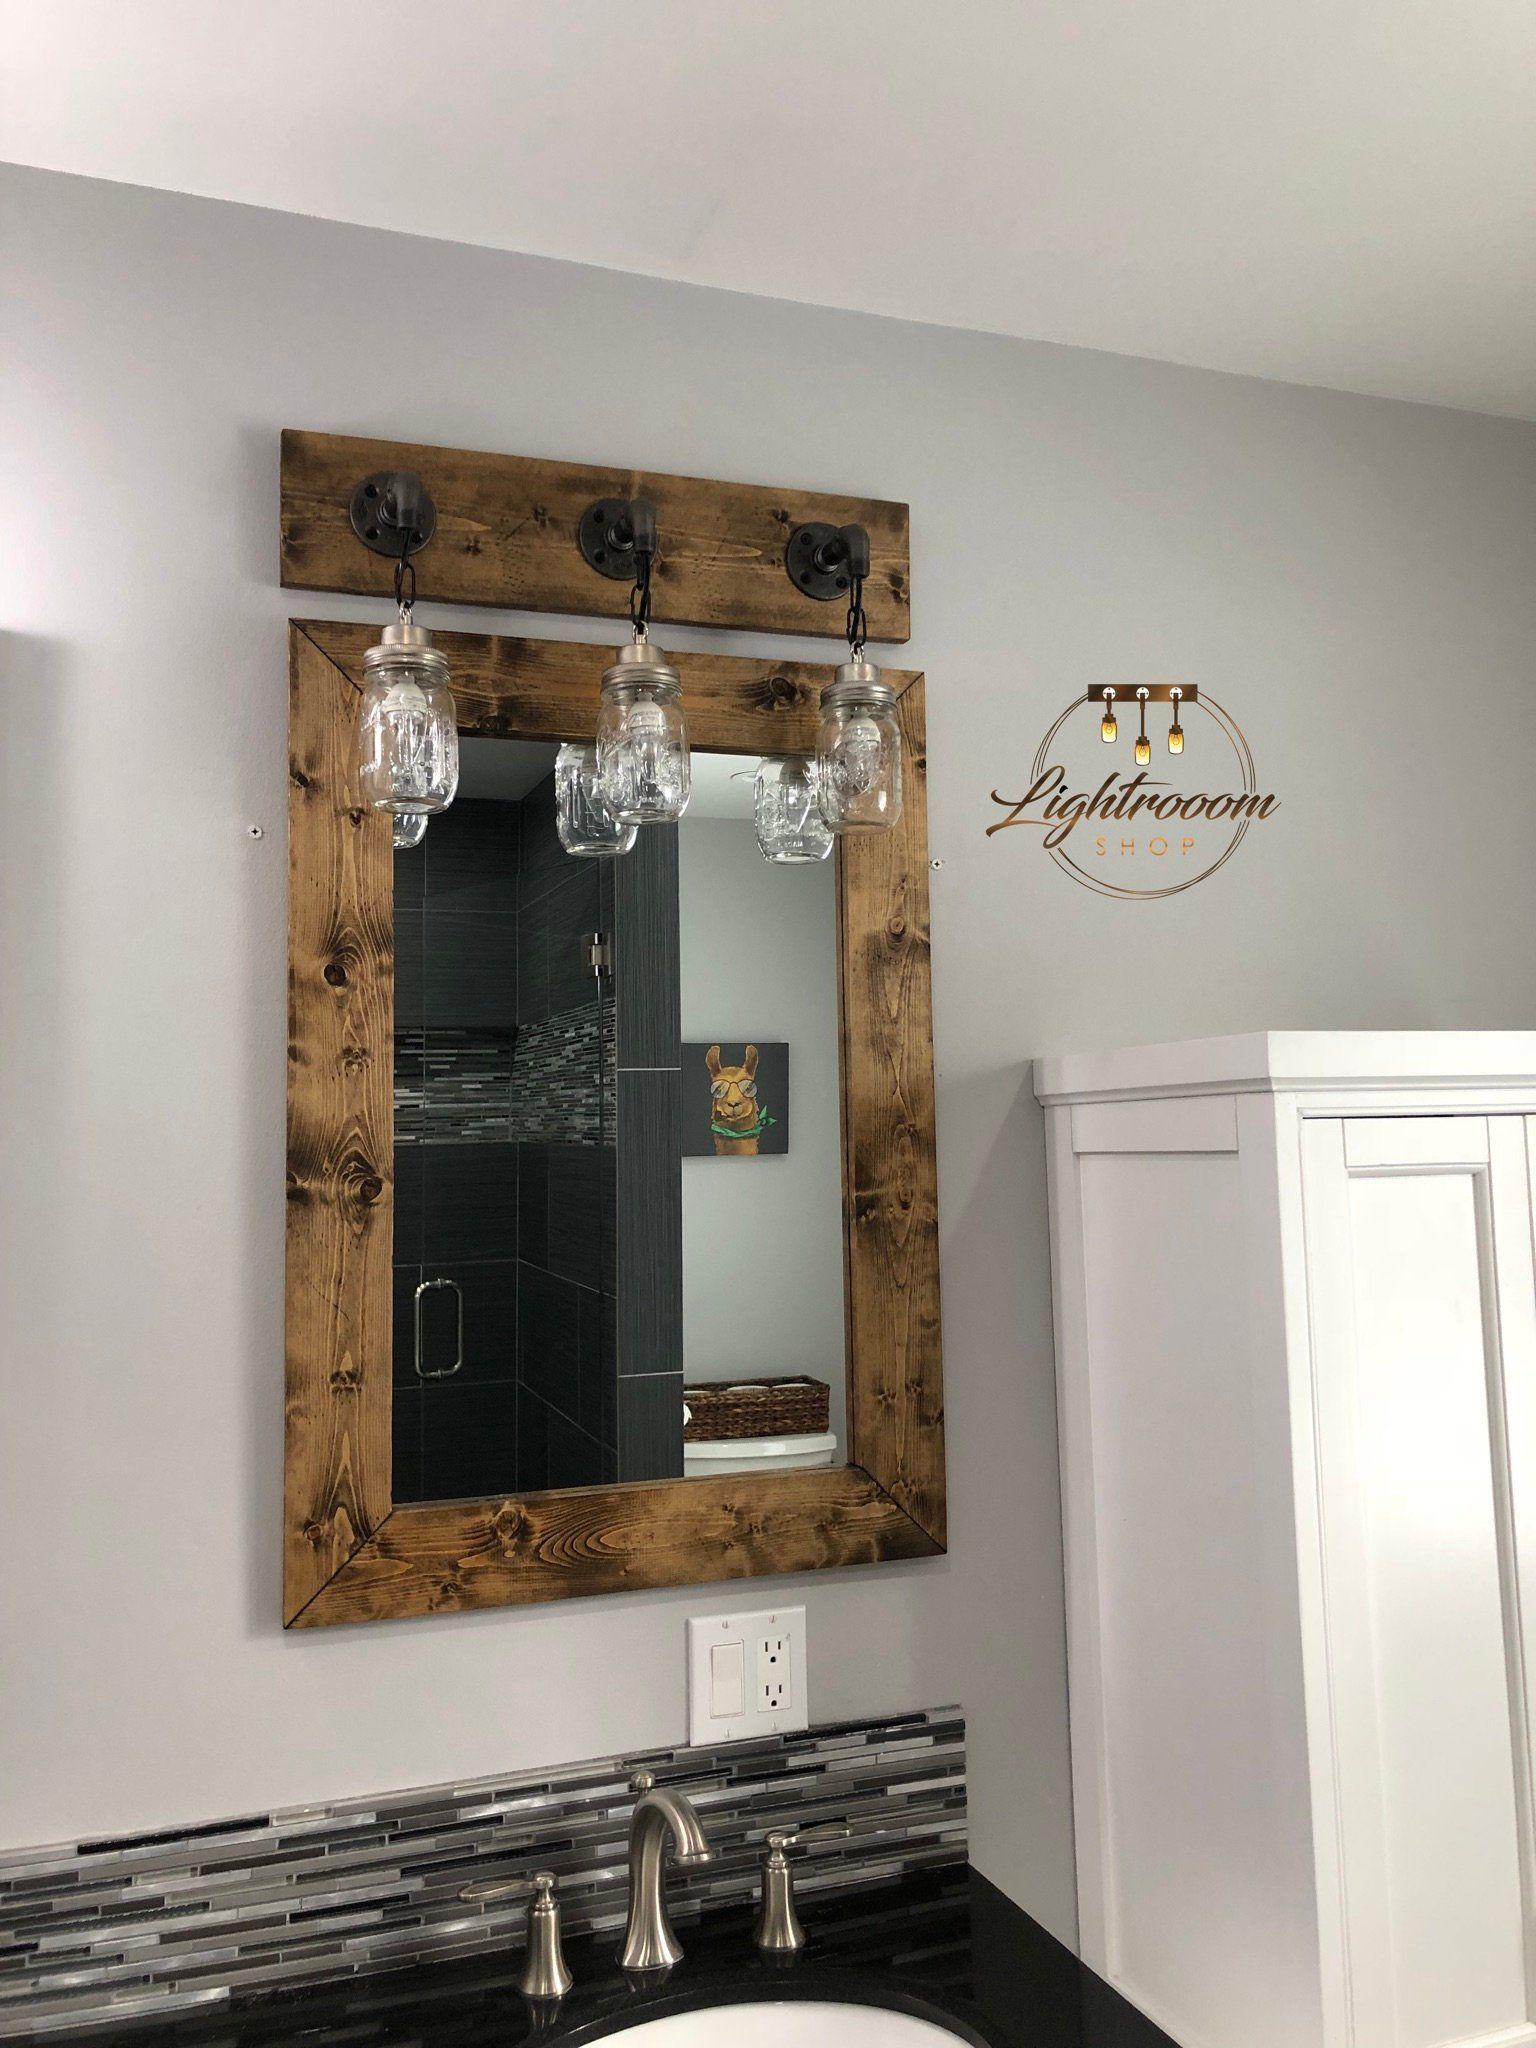 Mirror And Light Bathroom Set Bathroom Vanity Mason Jar Light Etsy Farmhouse Mirrors Wood Framed Mirror Mason Jar Light Fixture [ 2048 x 1536 Pixel ]